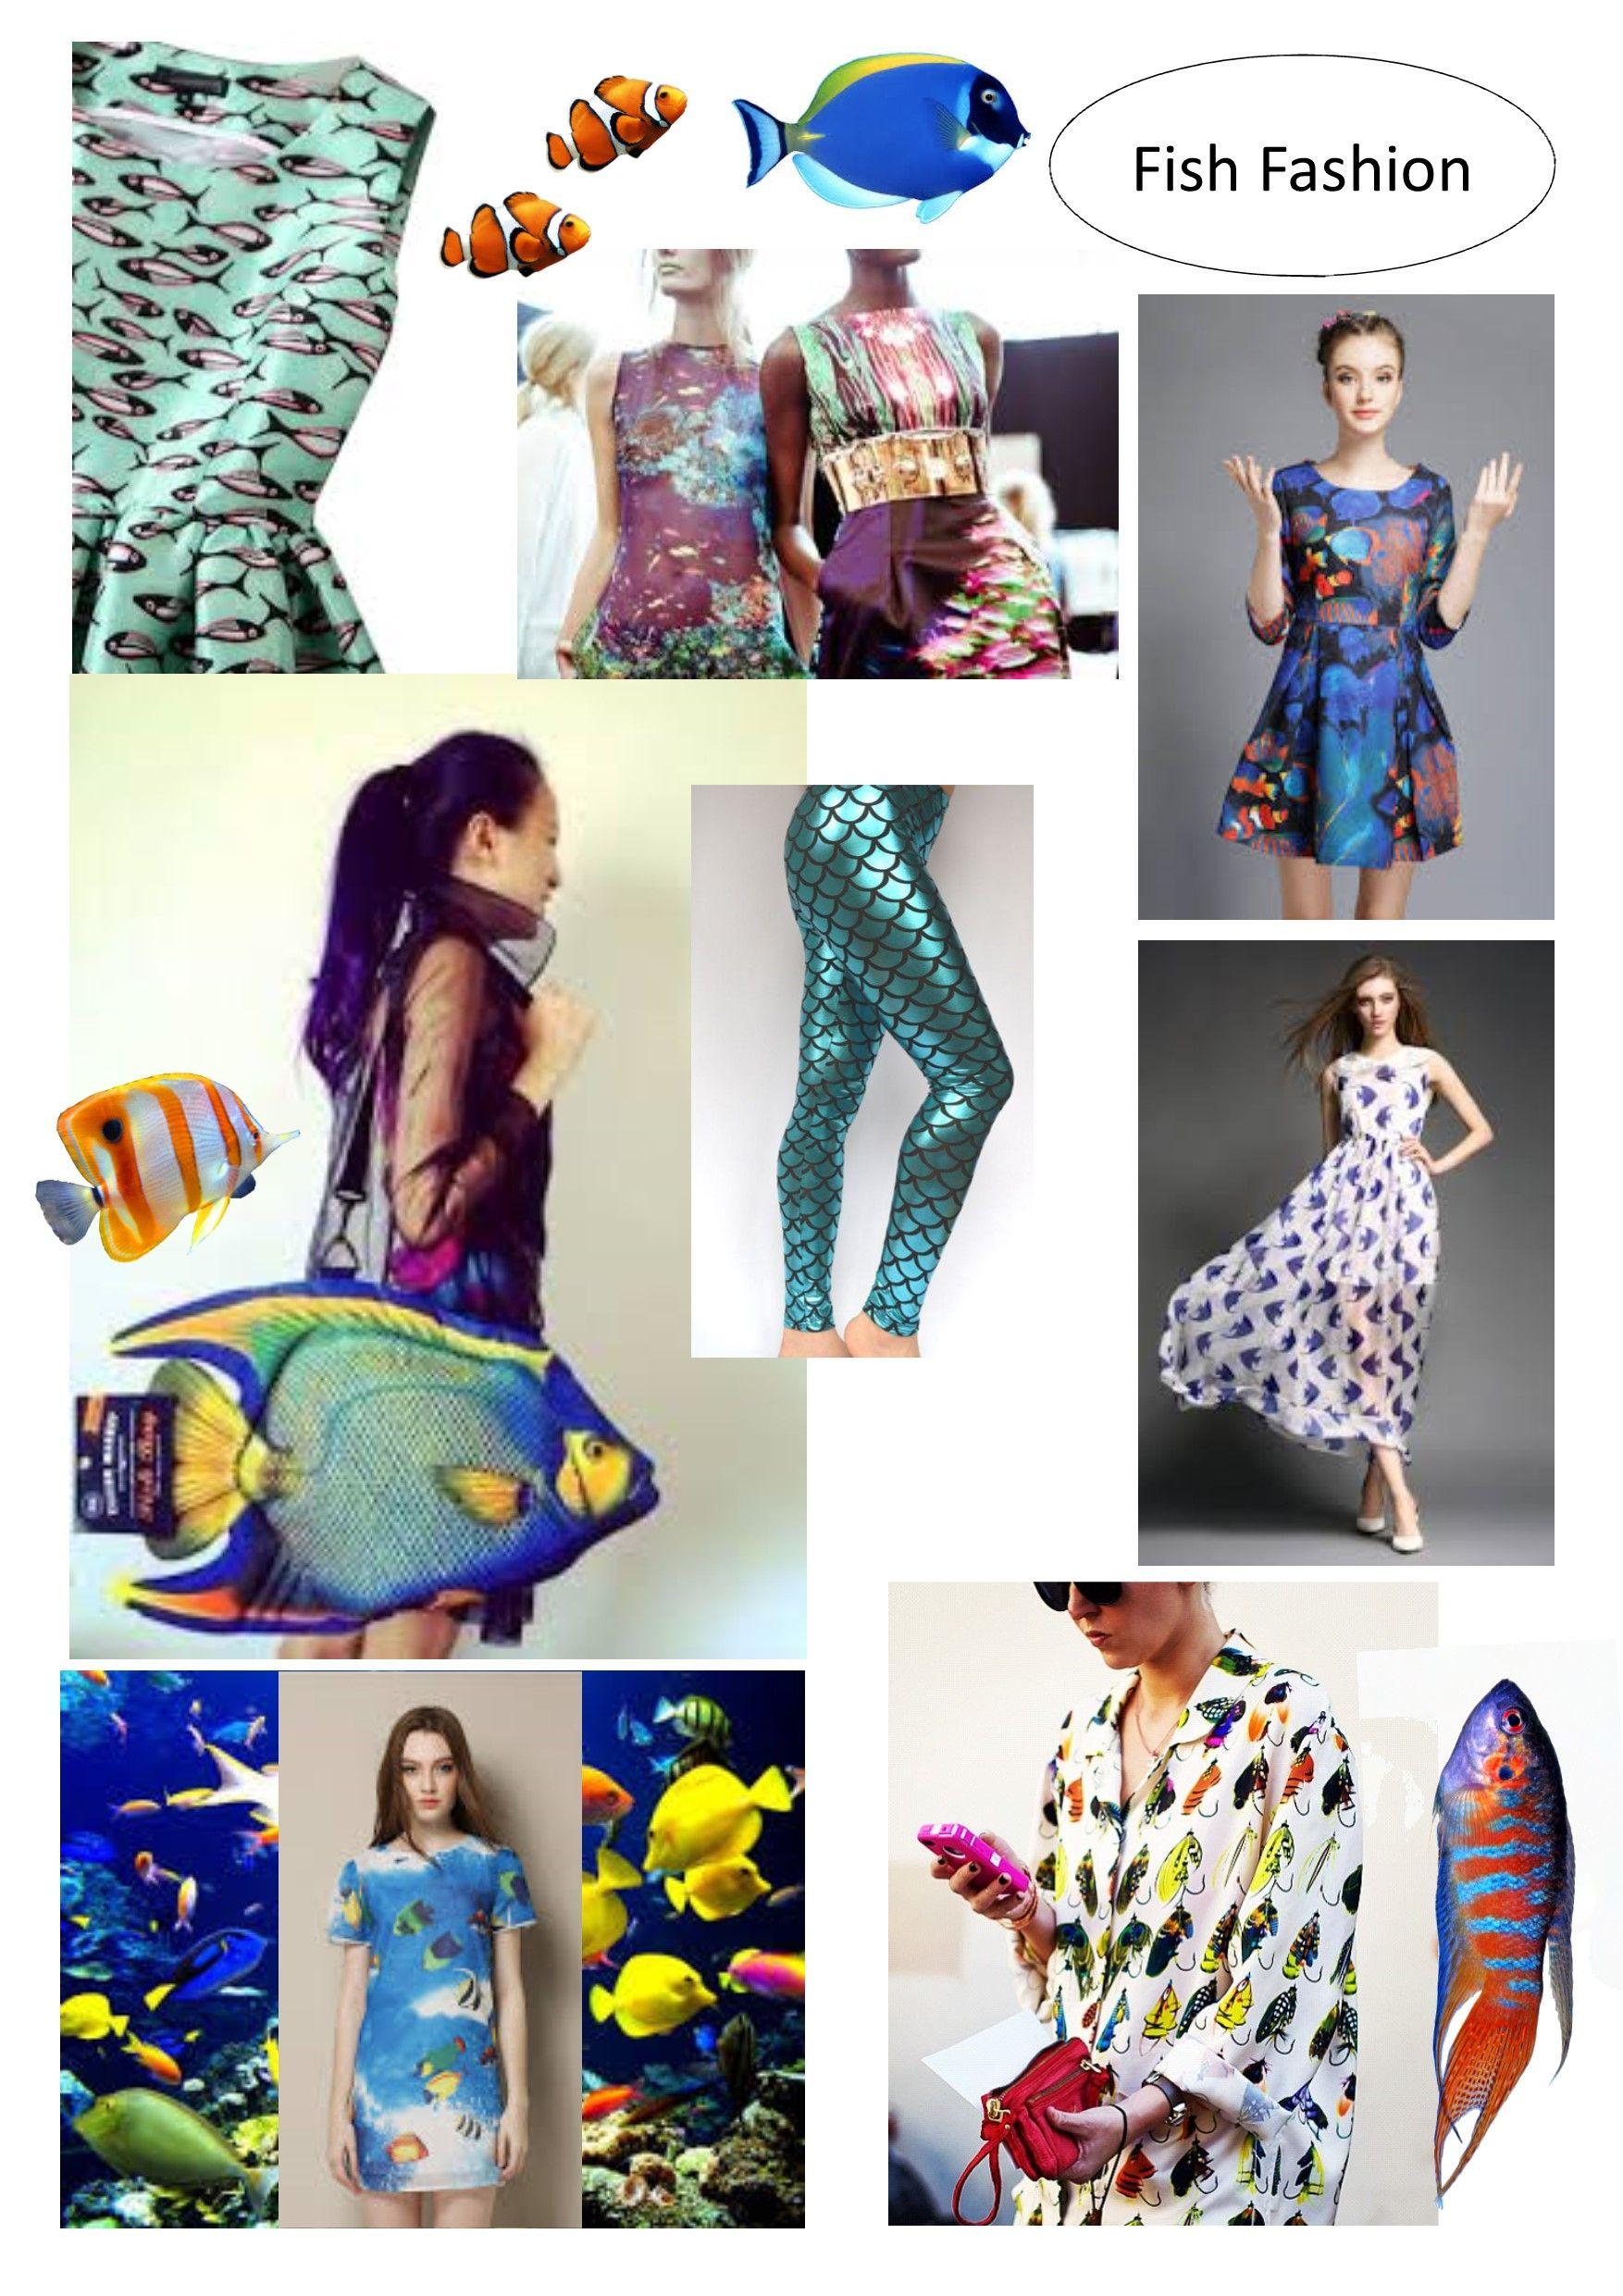 Marine Life Moodboard 2 Fashion Show Themes Underwater Theme Marine Theme